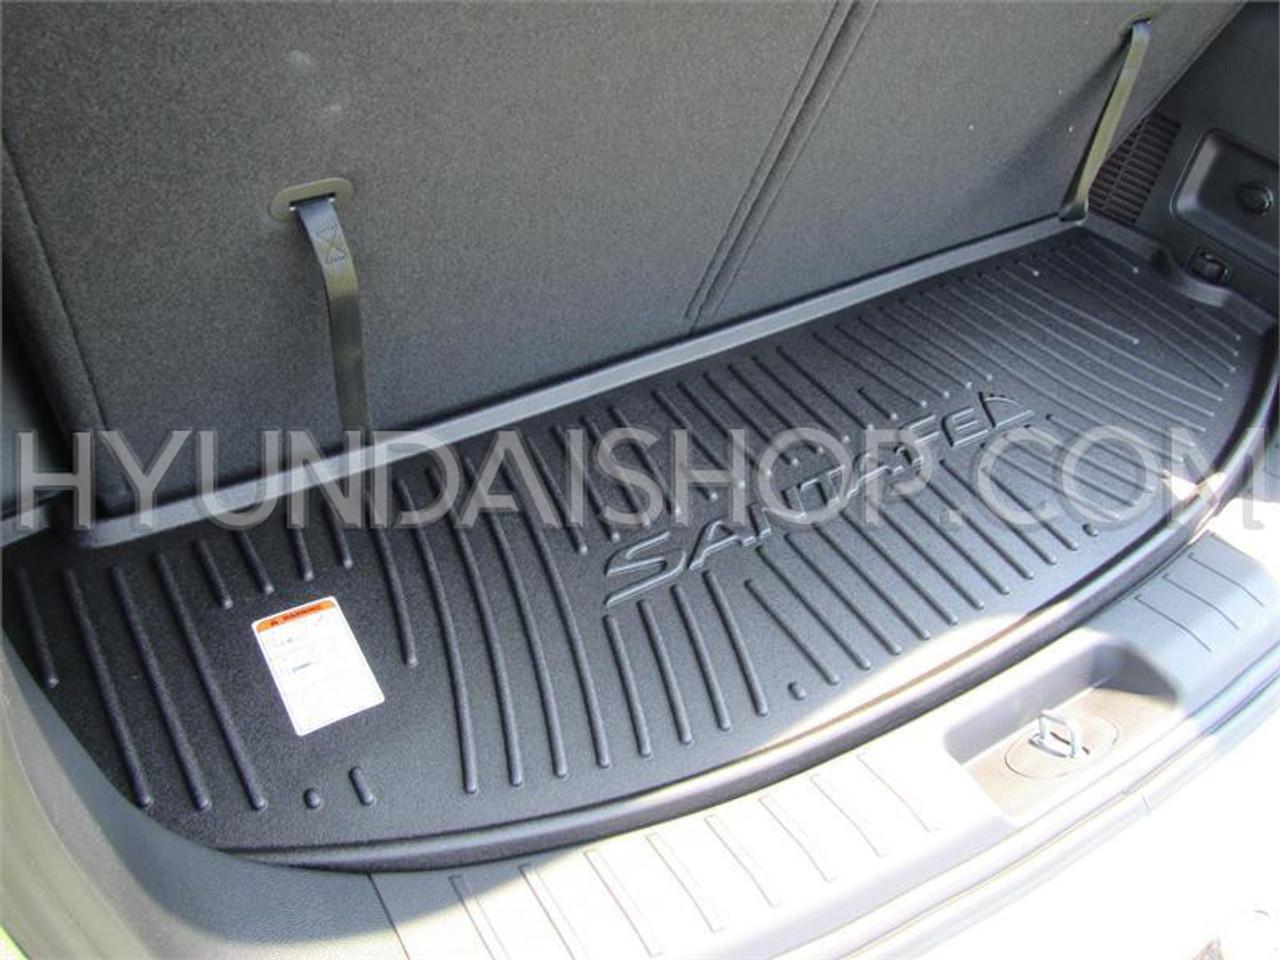 Hyundai Santa Fe Rubber Cargo Tray - 6/7 Passenger Model